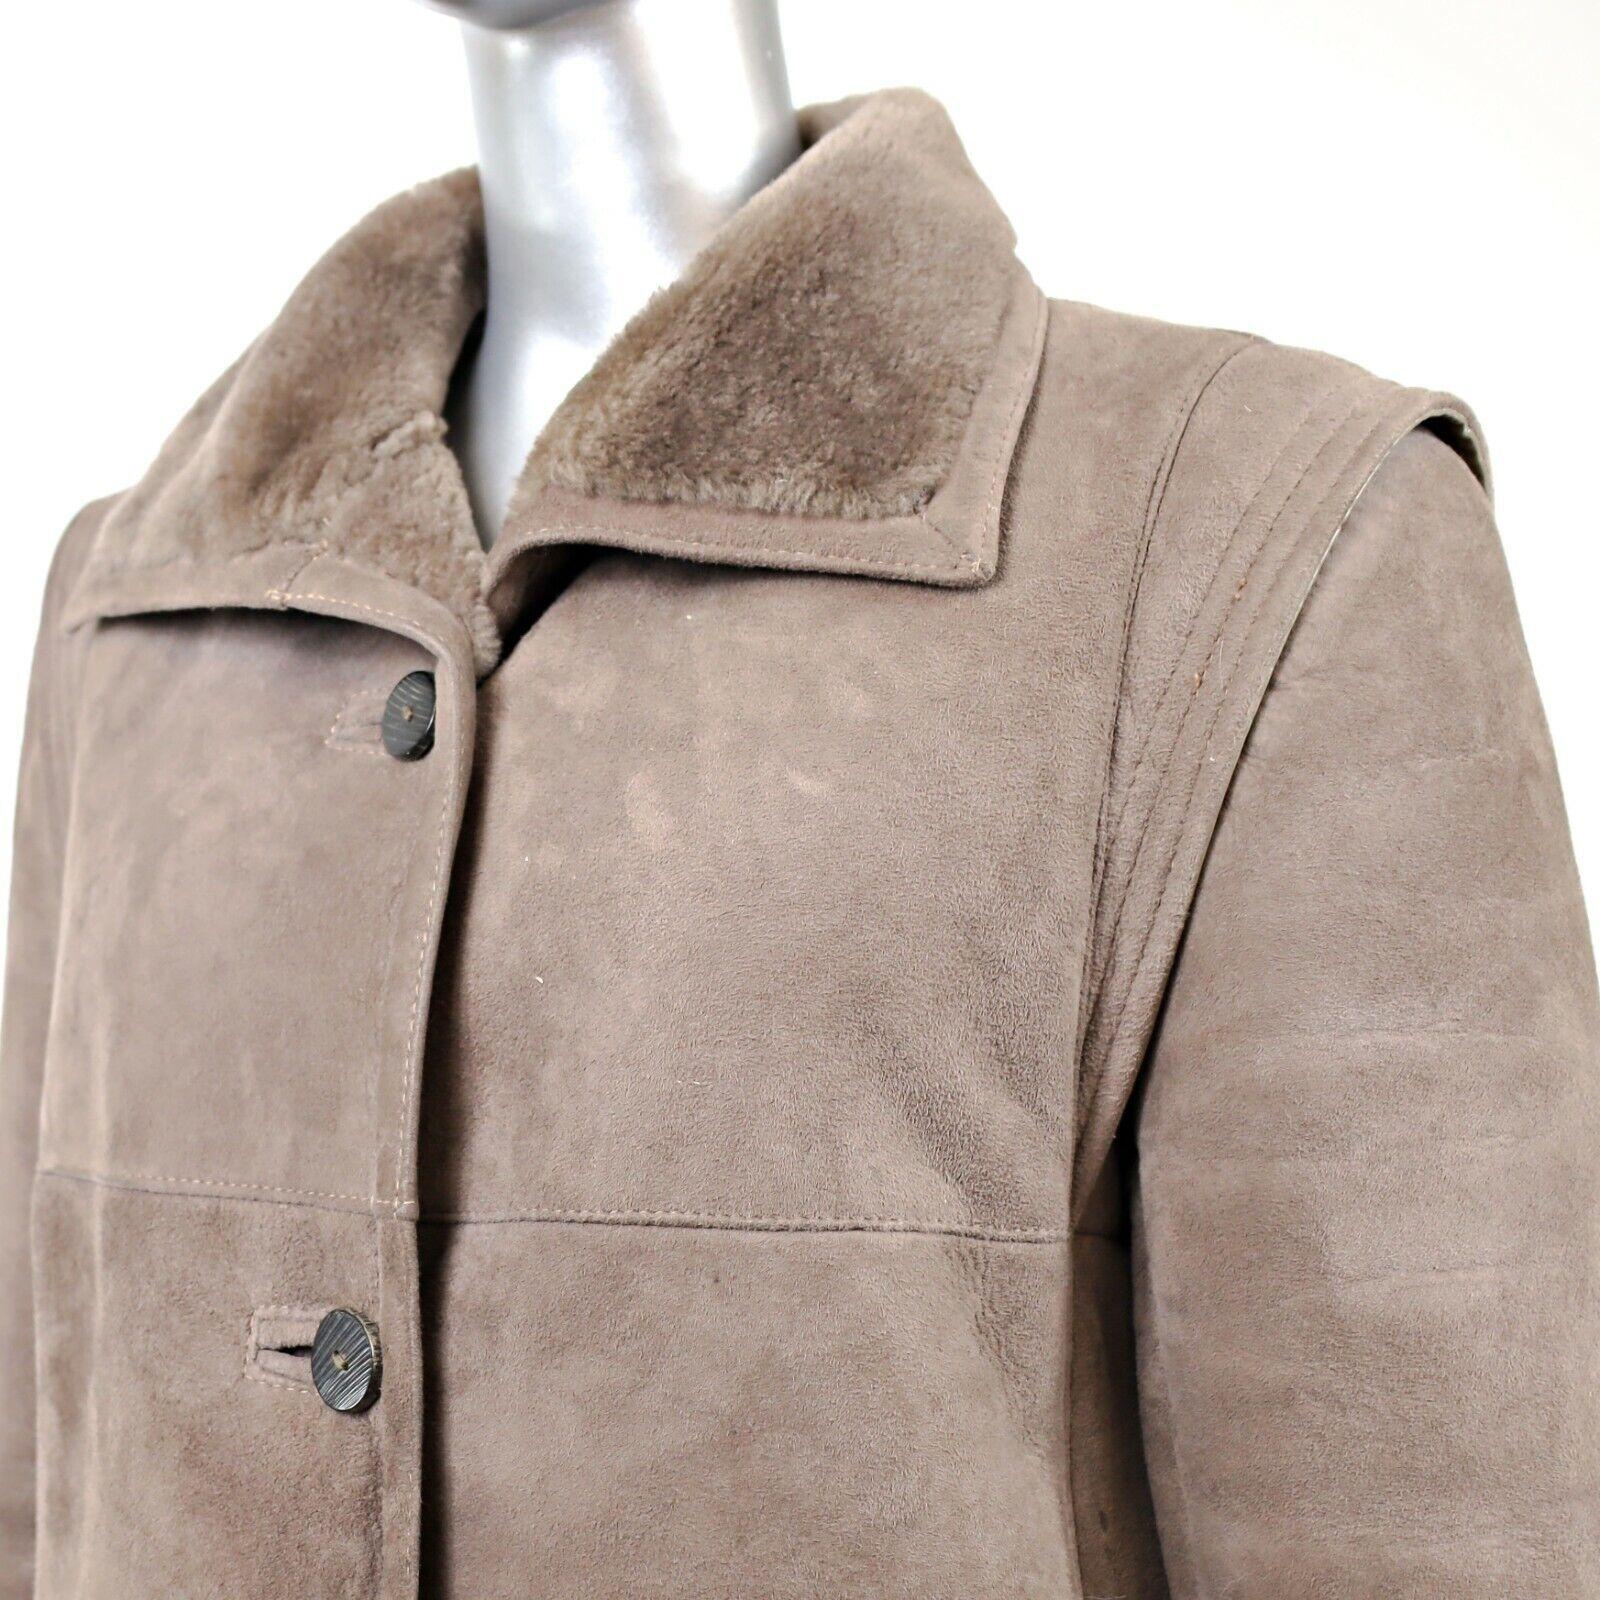 Full Length Shearling Coat- Size M-L (Vintage Fur… - image 6